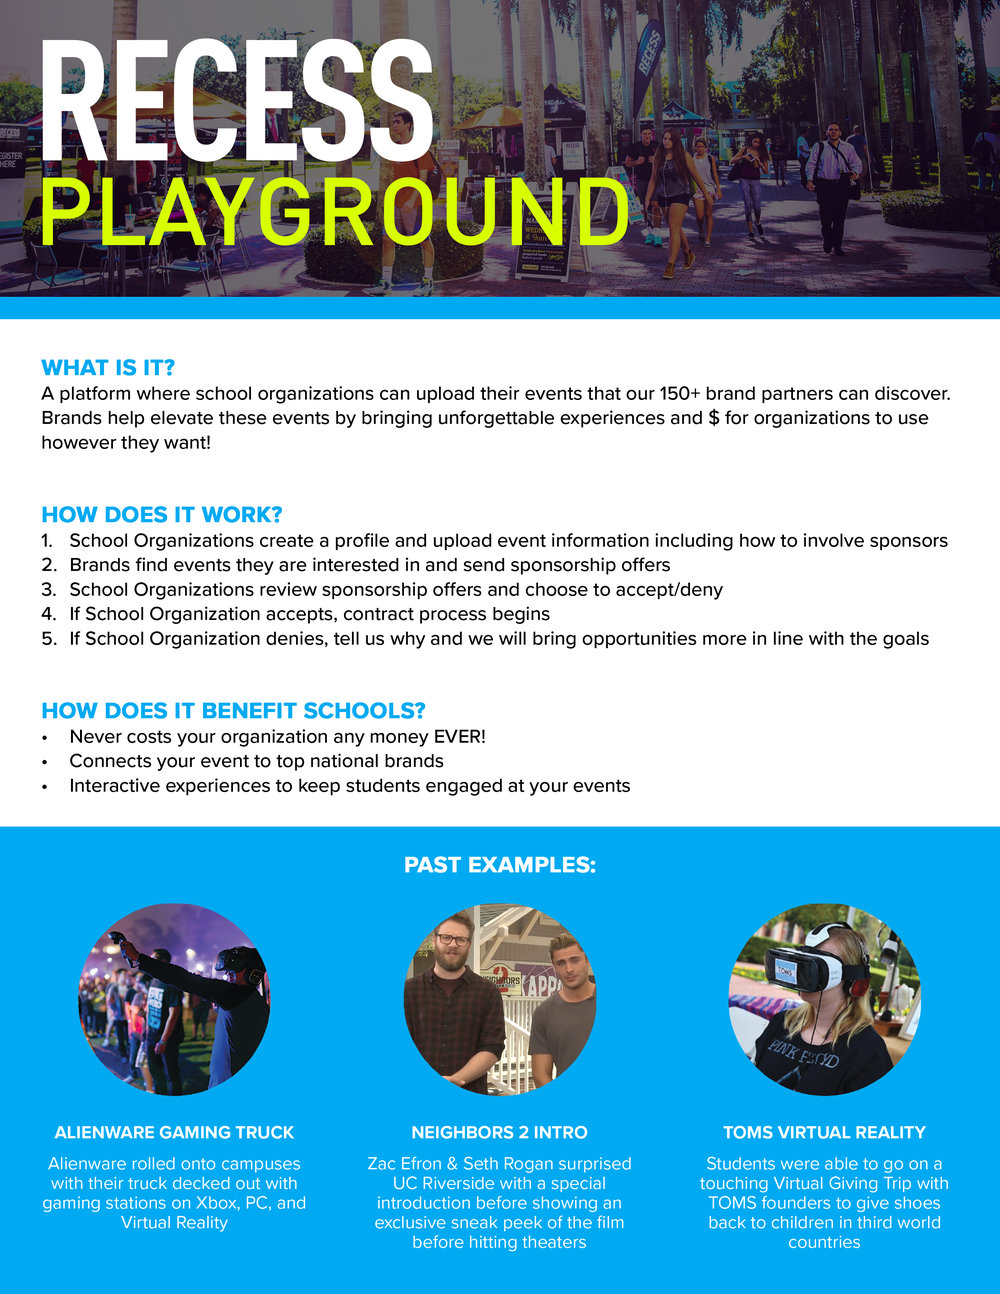 RECESS Playground Platform pg 1.jpg